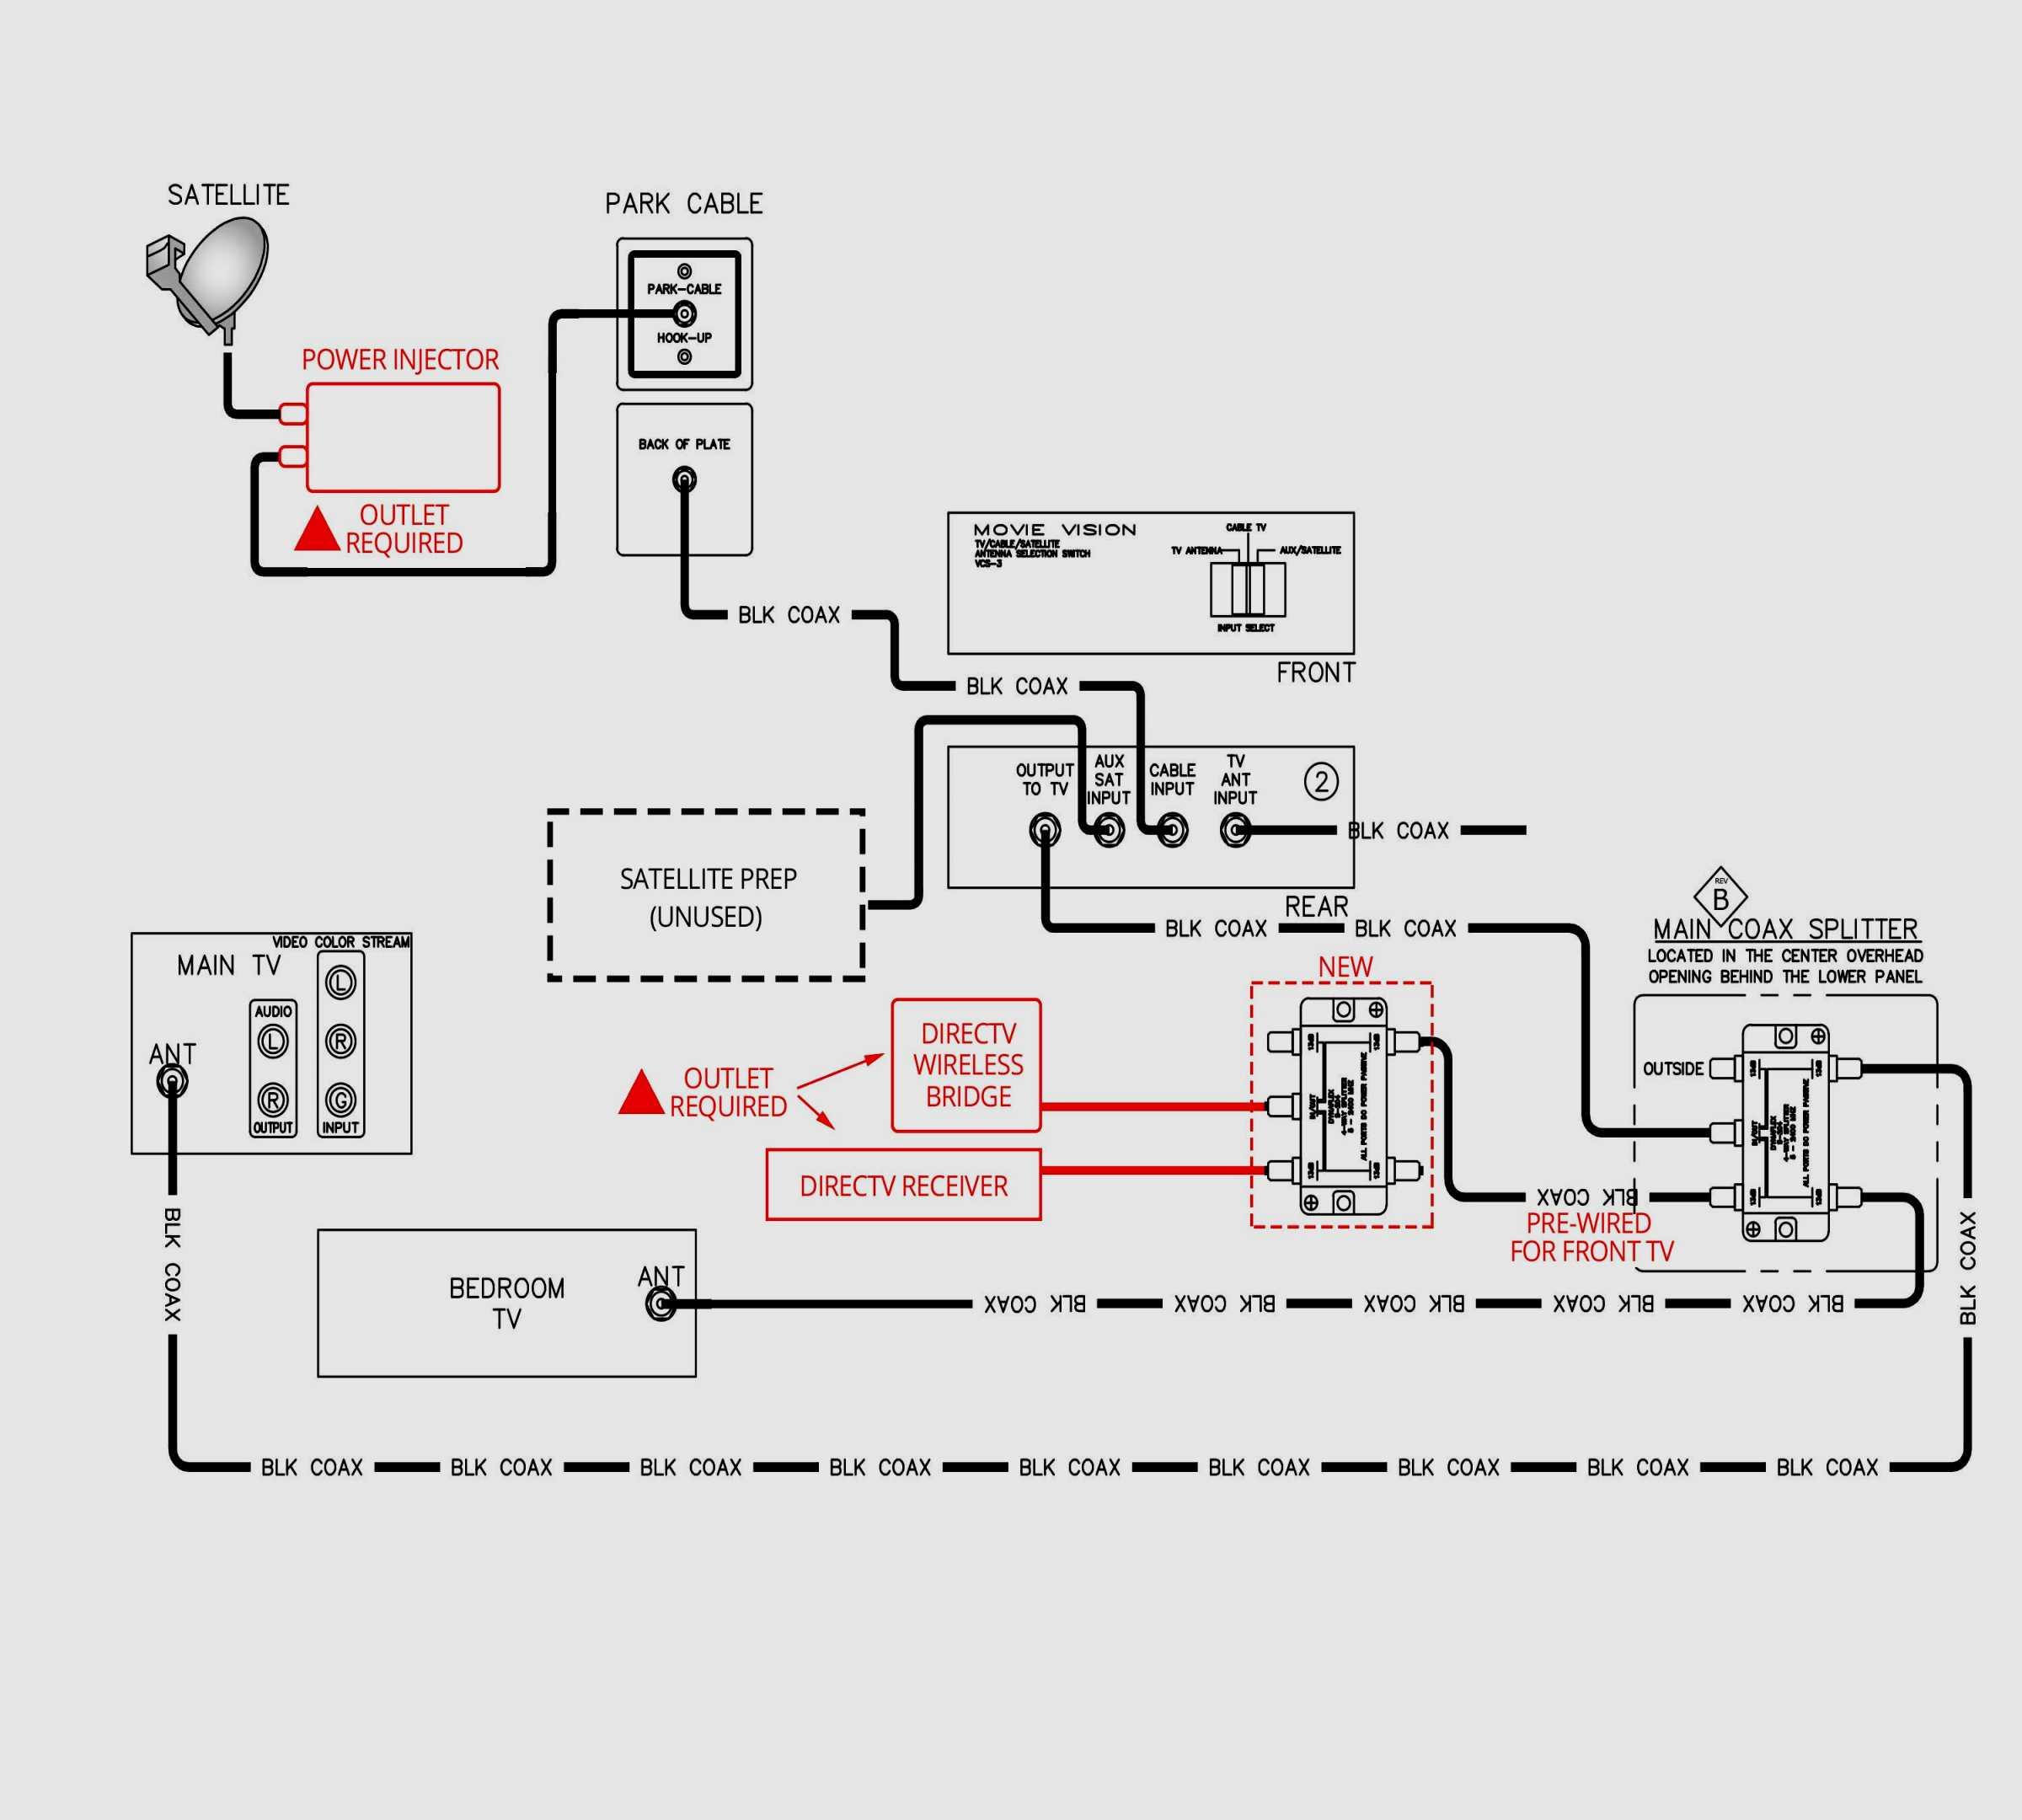 [DIAGRAM] Direct Tv Satellite Dish Wiring Diagram FULL